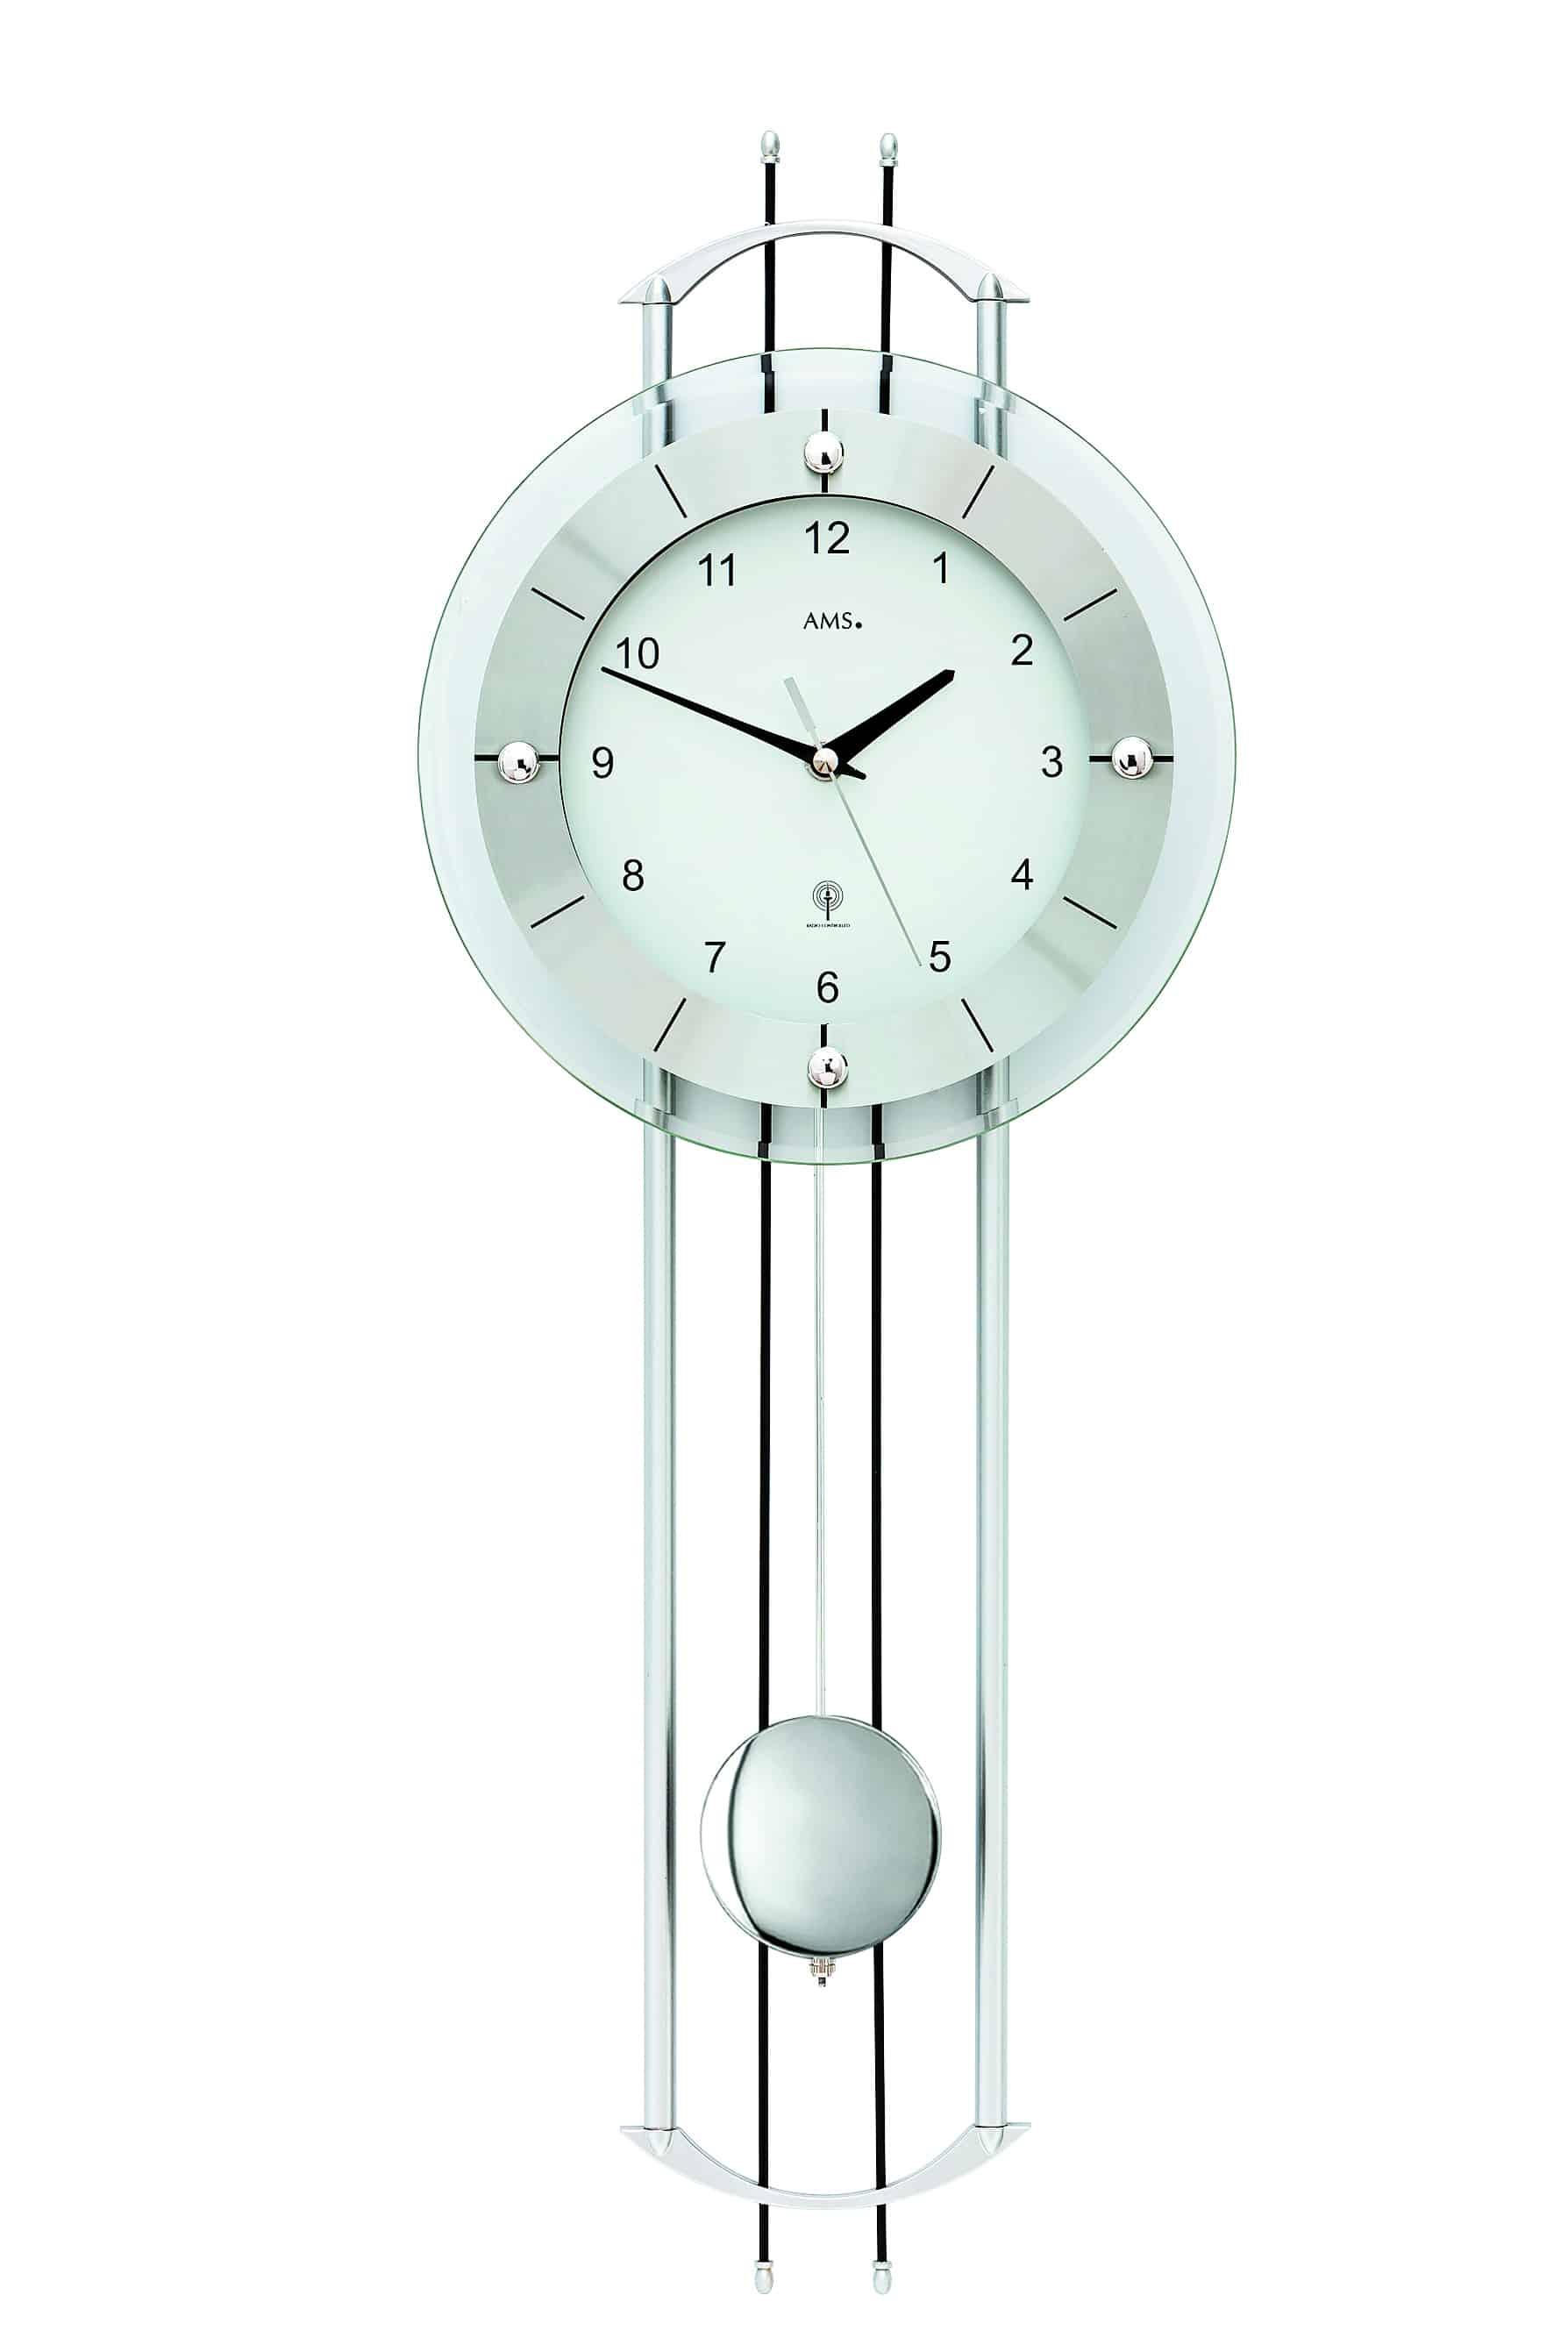 Ams 5248 Radio Control Quartz Clock Ams Clocks